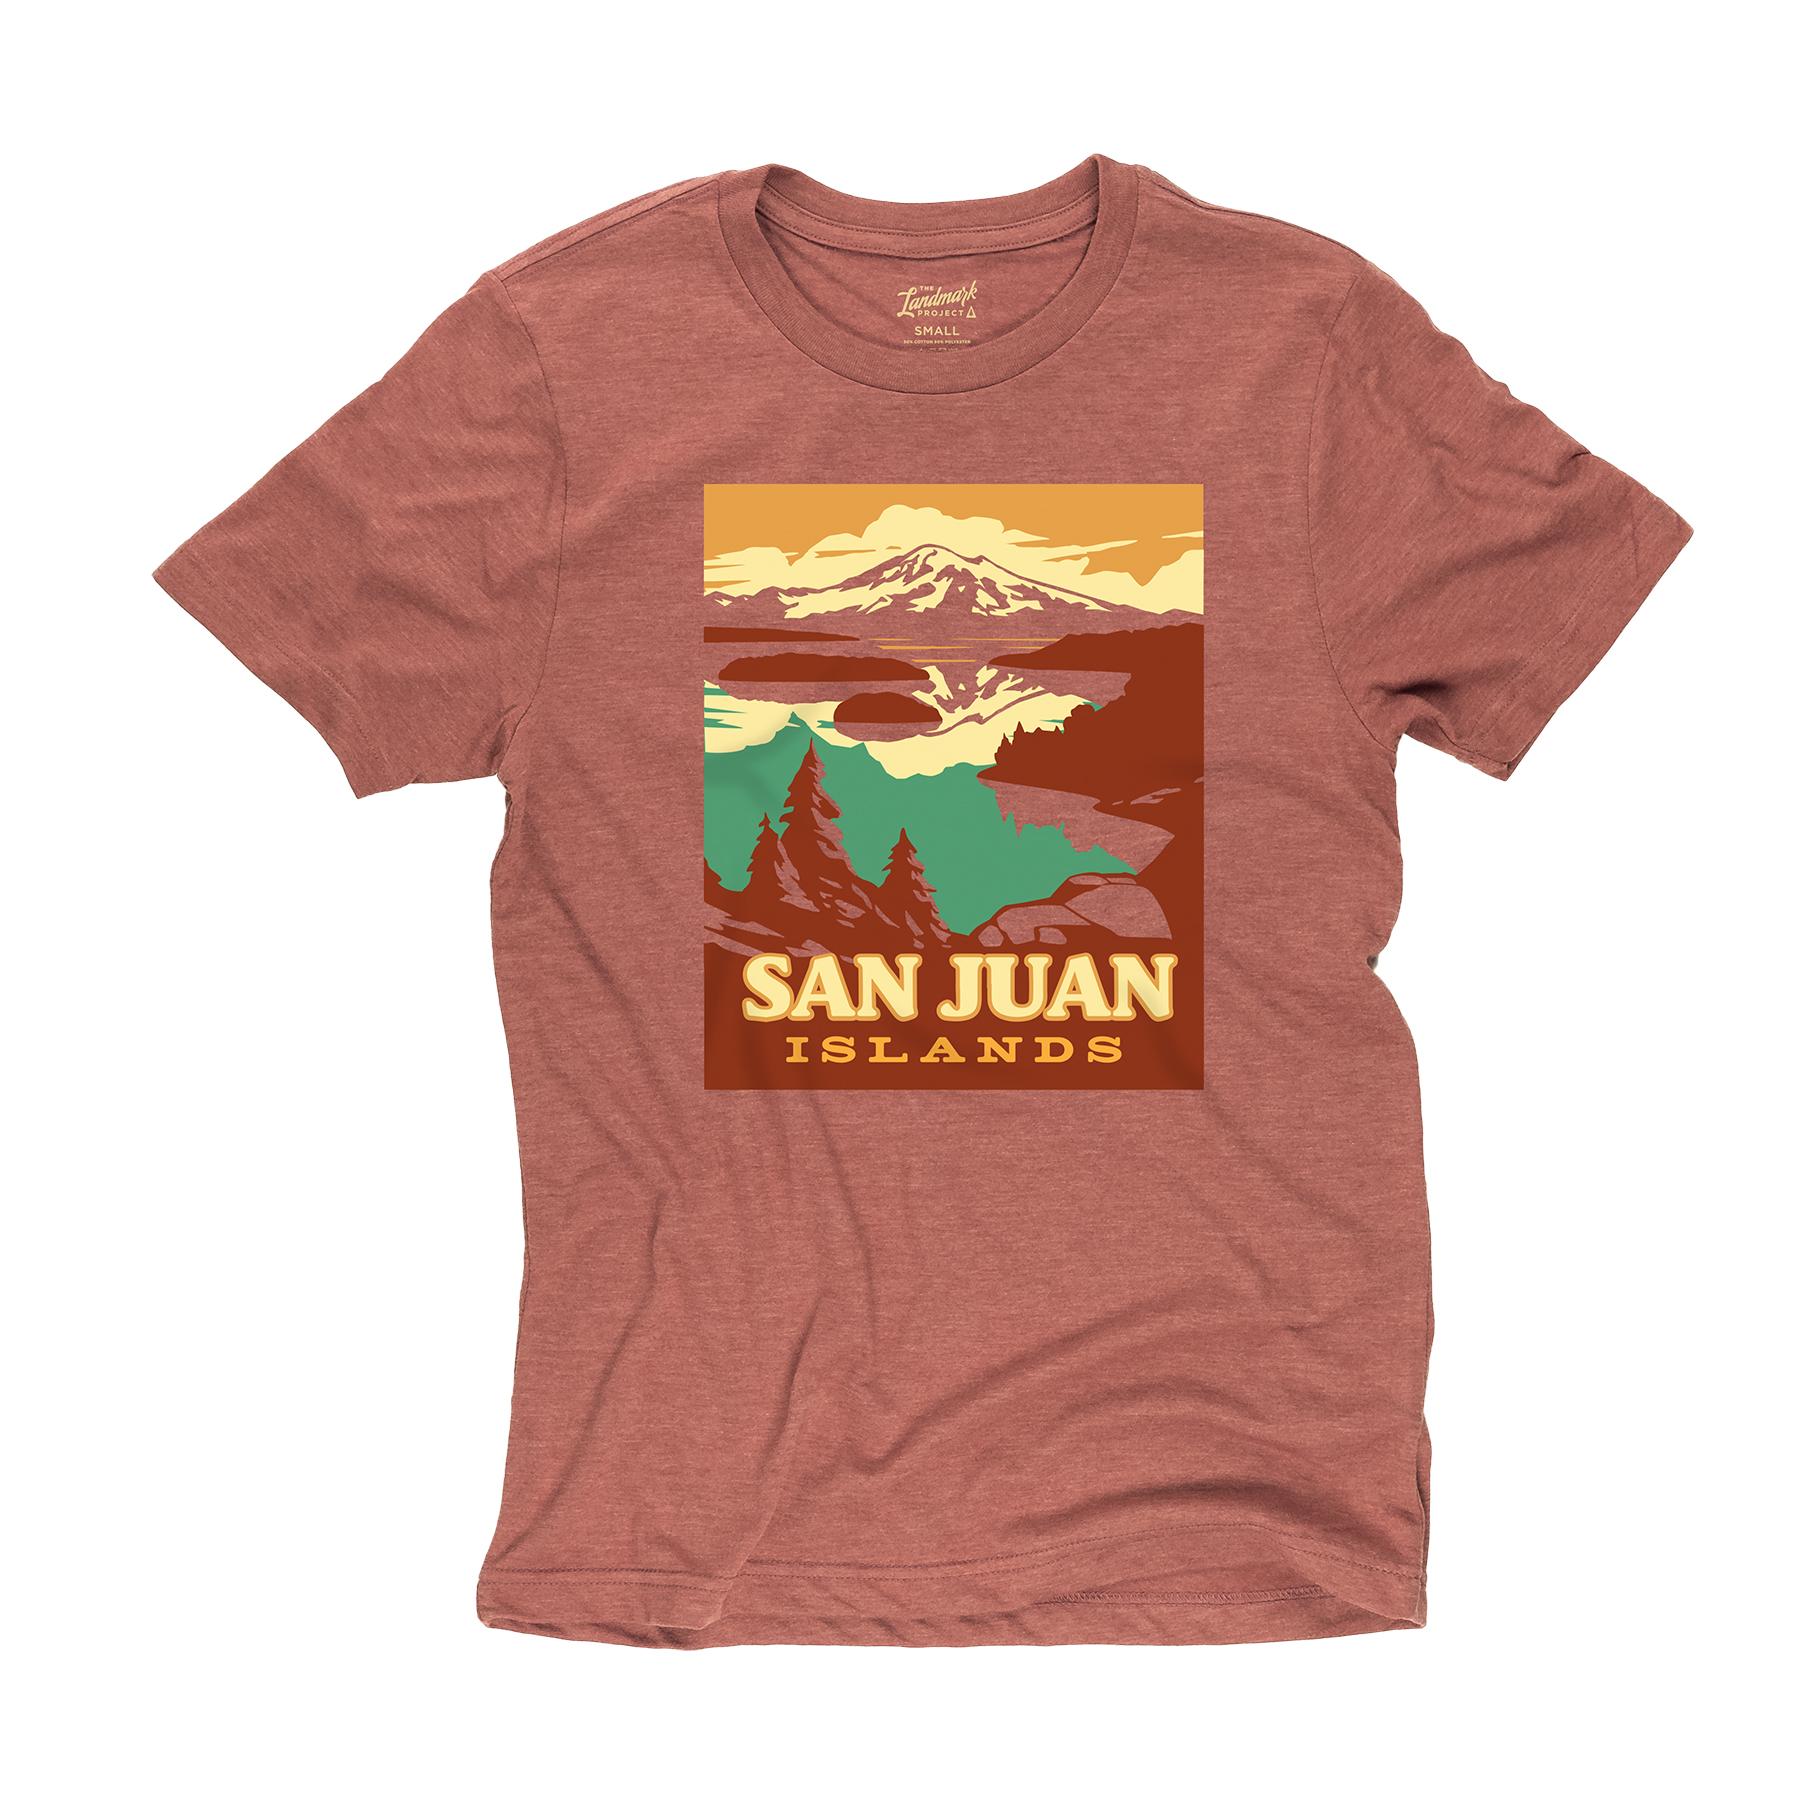 san-juan-islands-redrocks-tee.jpg